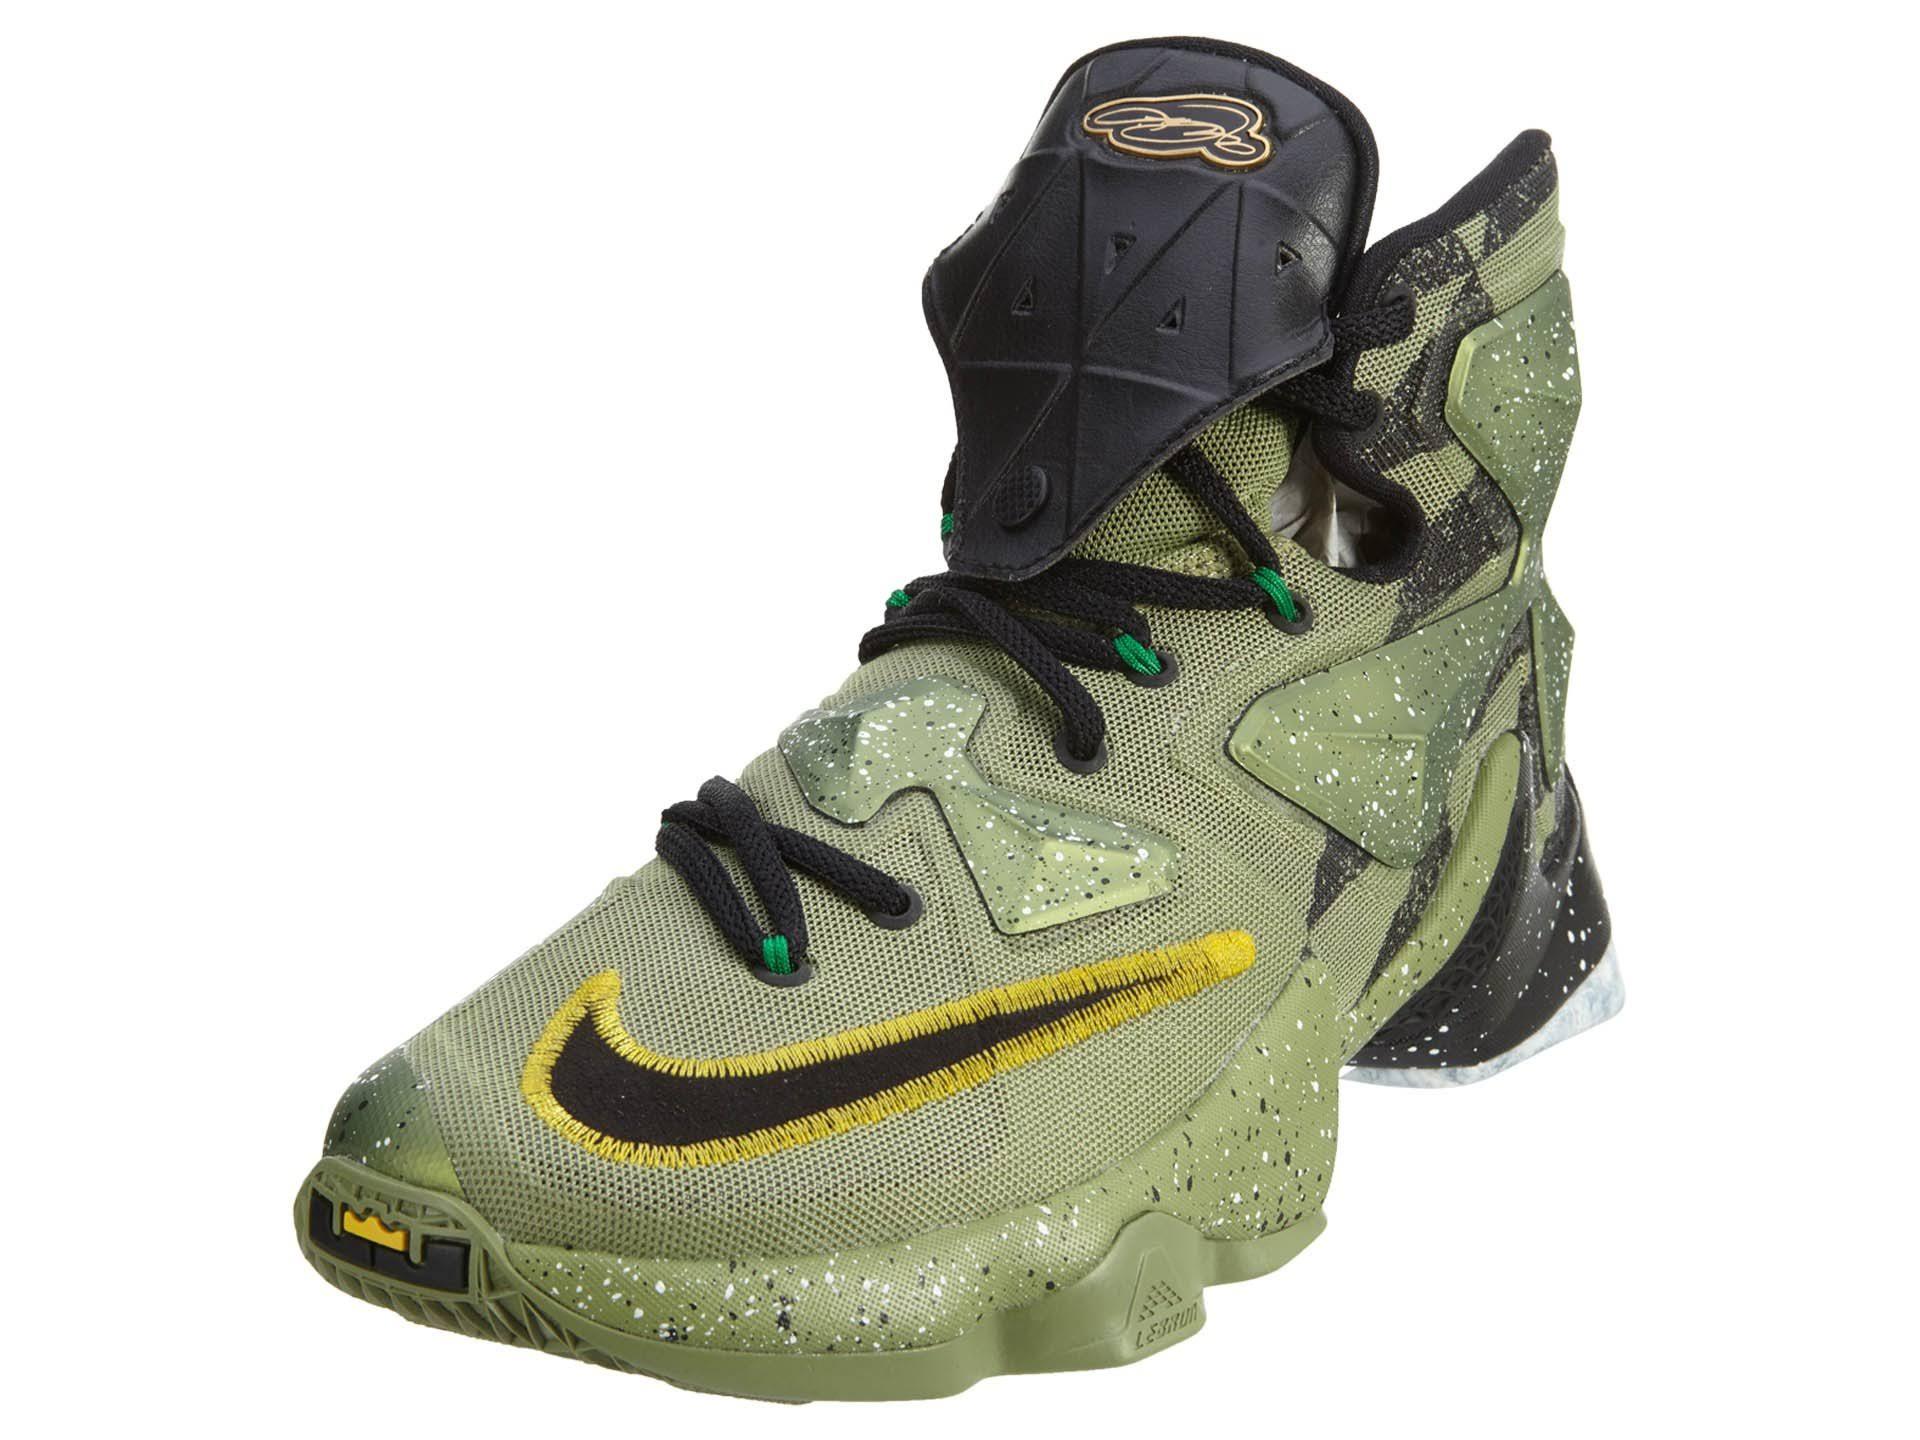 Schwarz As Männer Lebron 309 13 Größe 9 835659 5 Nike Alligator wqzfnUSEE